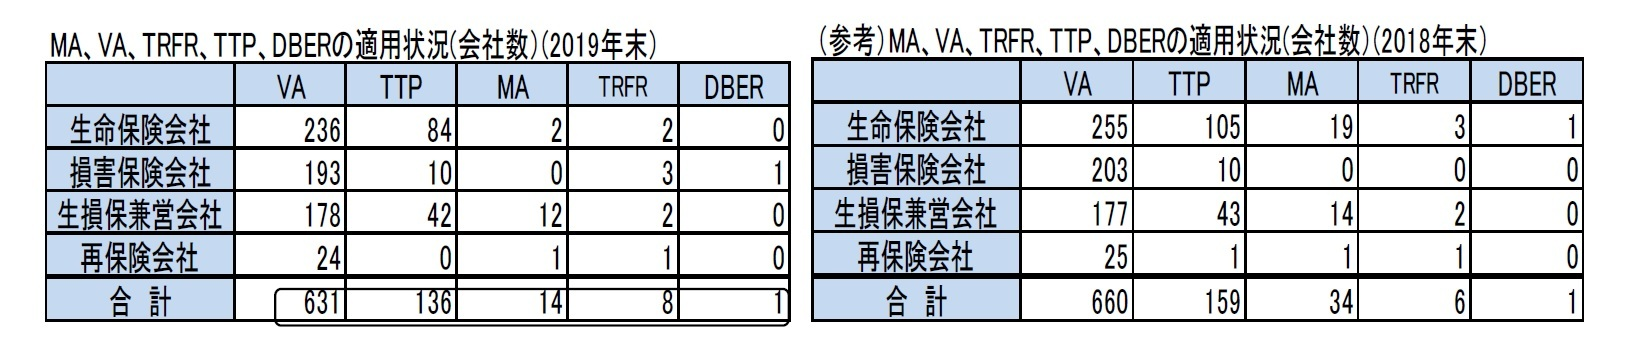 MA、VA、TRFR、TTP、DBERの適用状況(会社数)(2019年末)/(参考)MA、VA、TRFR、TTP、DBERの適用状況(会社数)(2018年末)